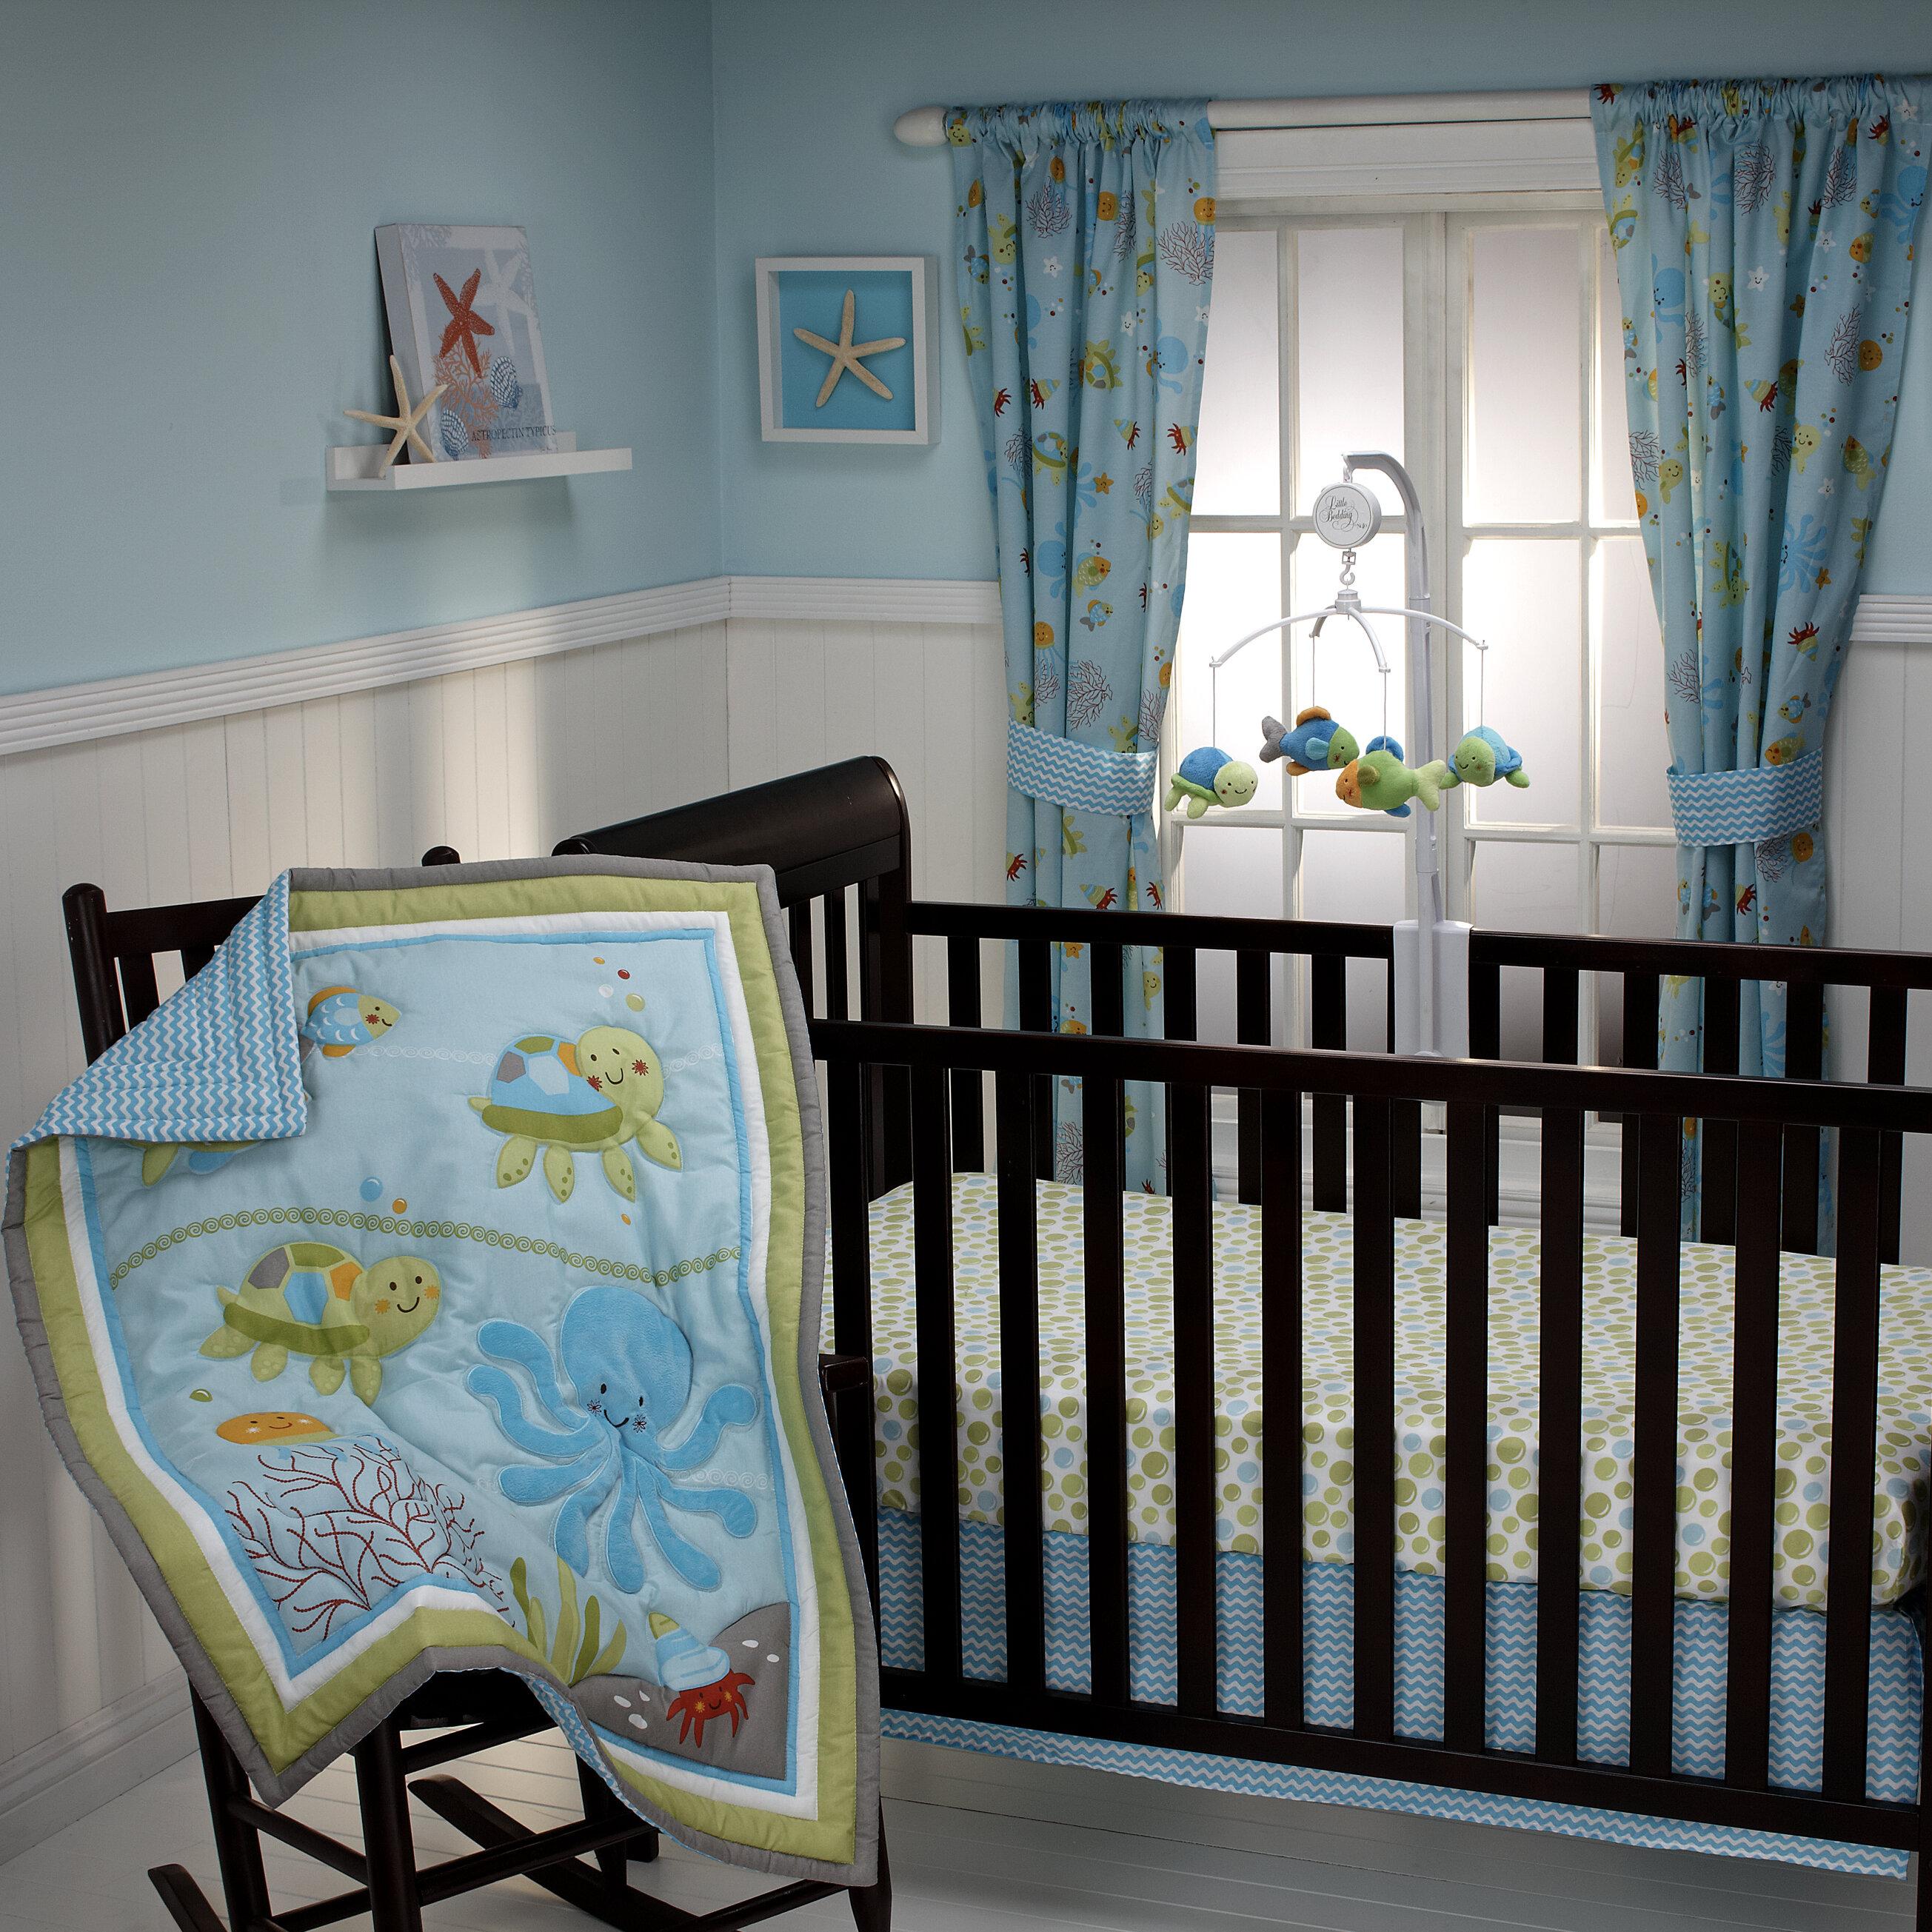 Crib Bedding Sets Up To 55 Off Through 02 16 Wayfair